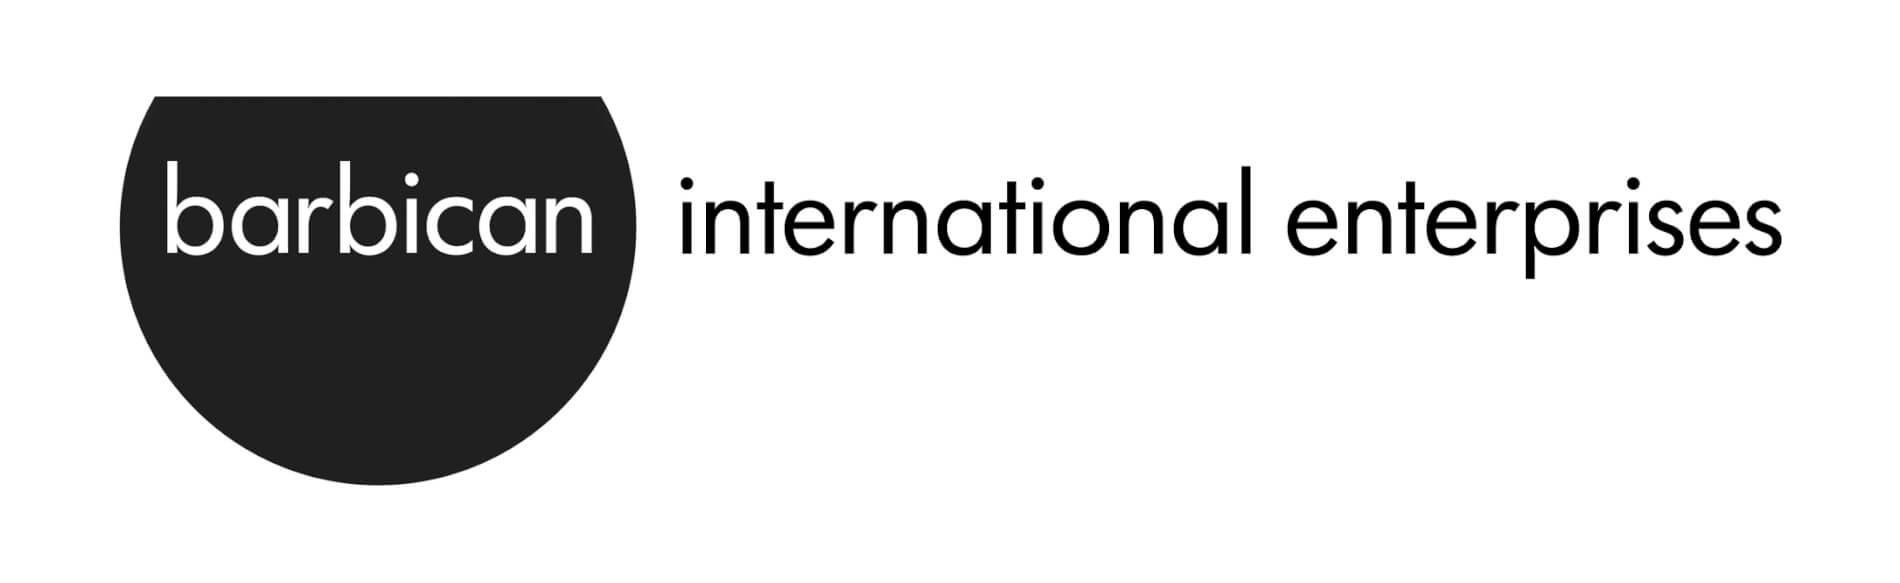 Barbican International Enterprises